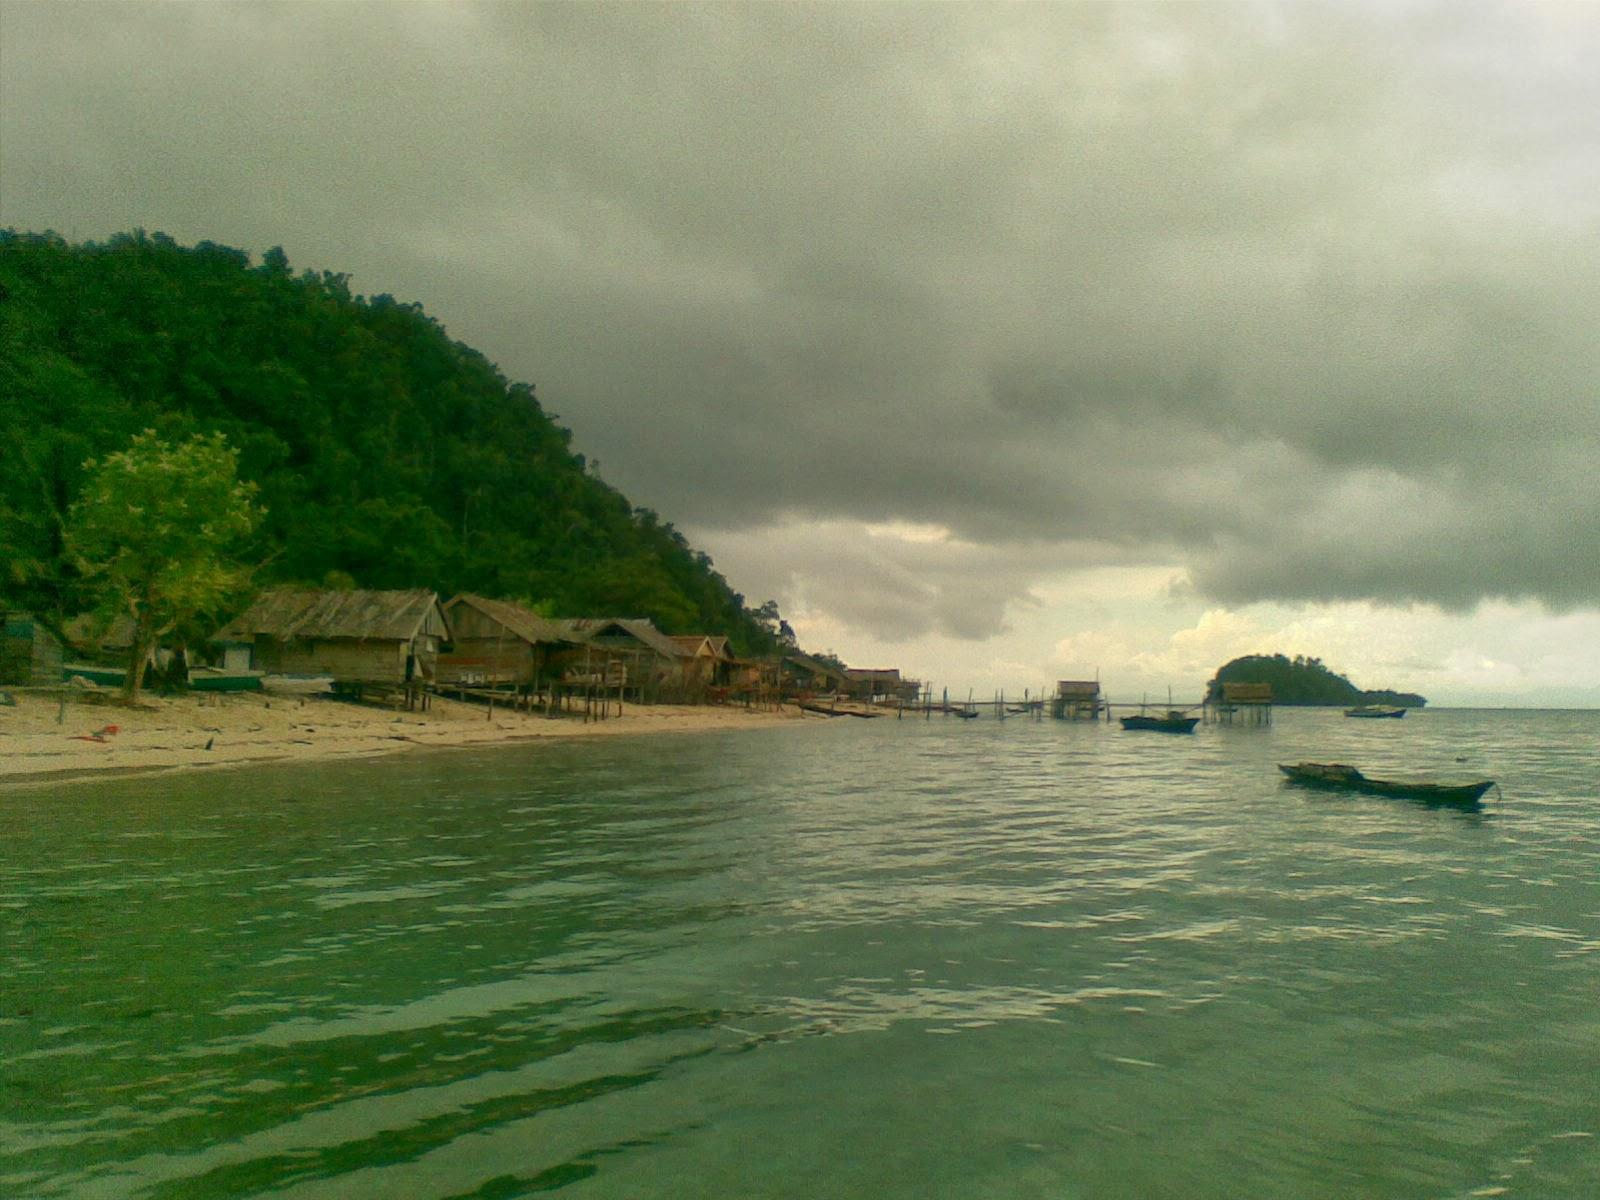 Image Result For Wisata Raja Ampat